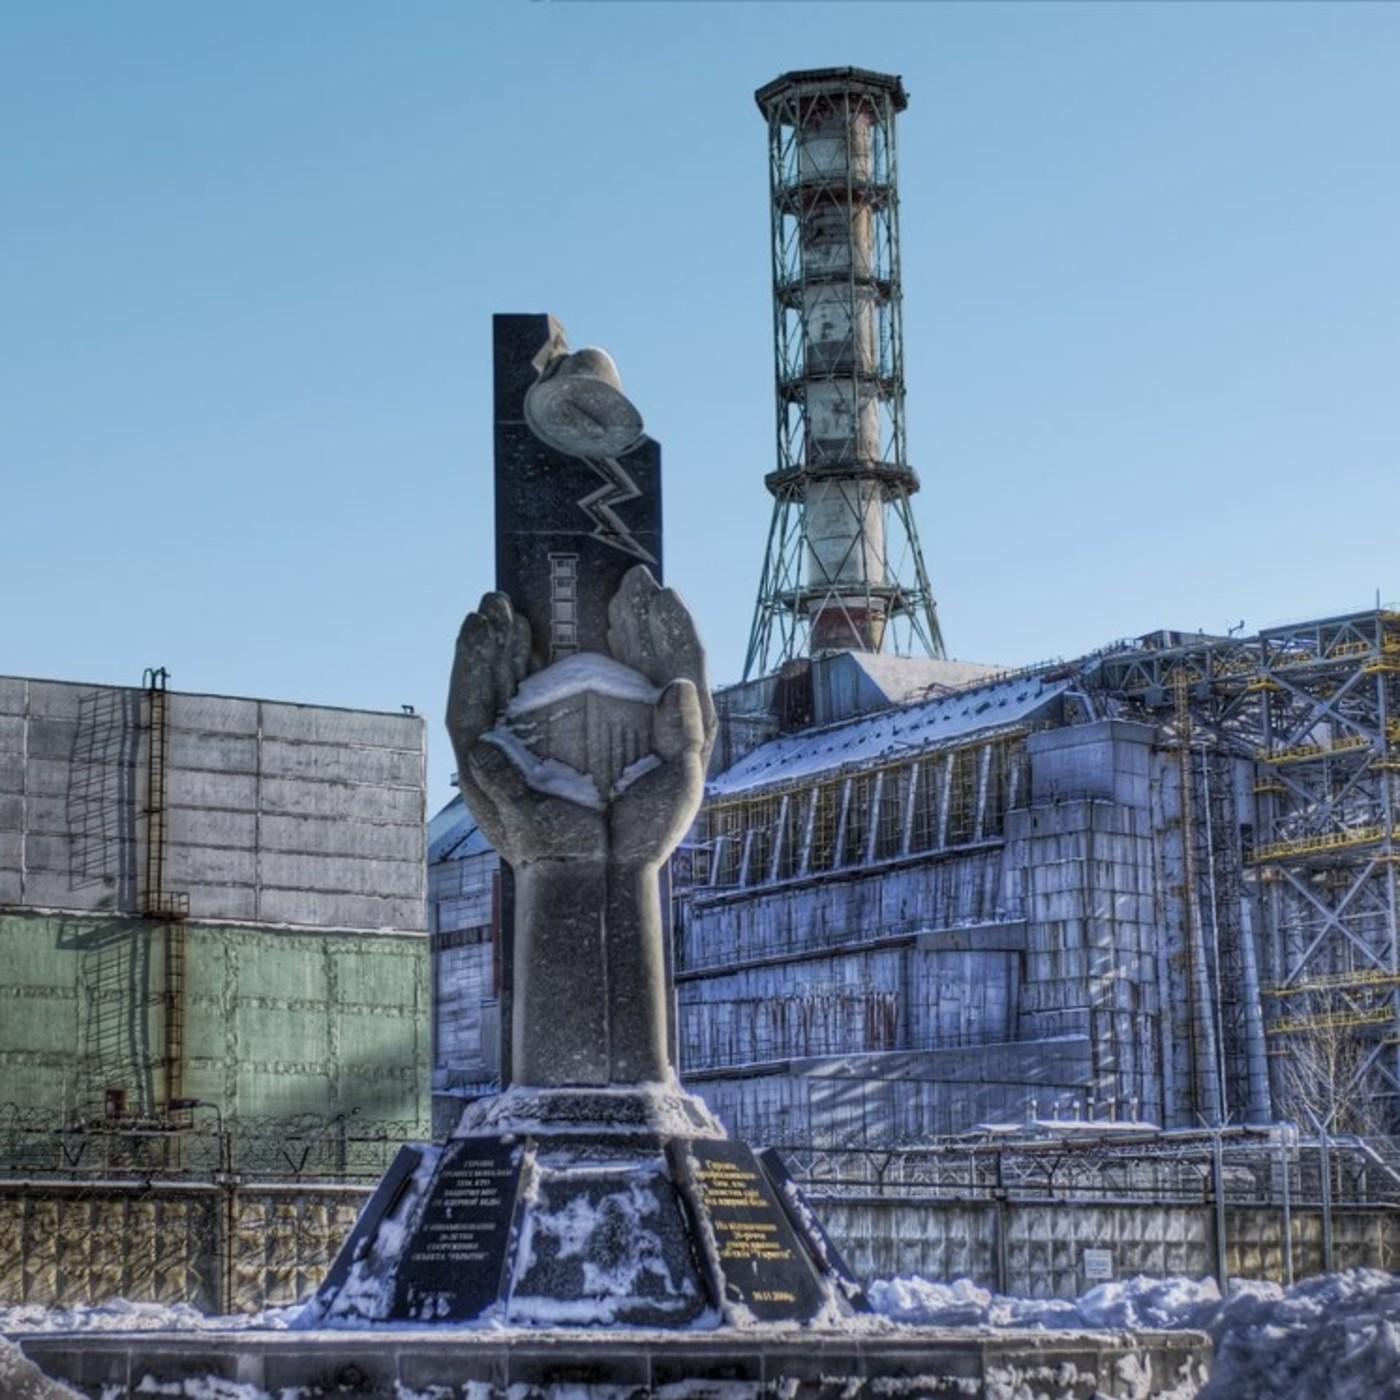 Chernóbil, la herencia nuclear humana